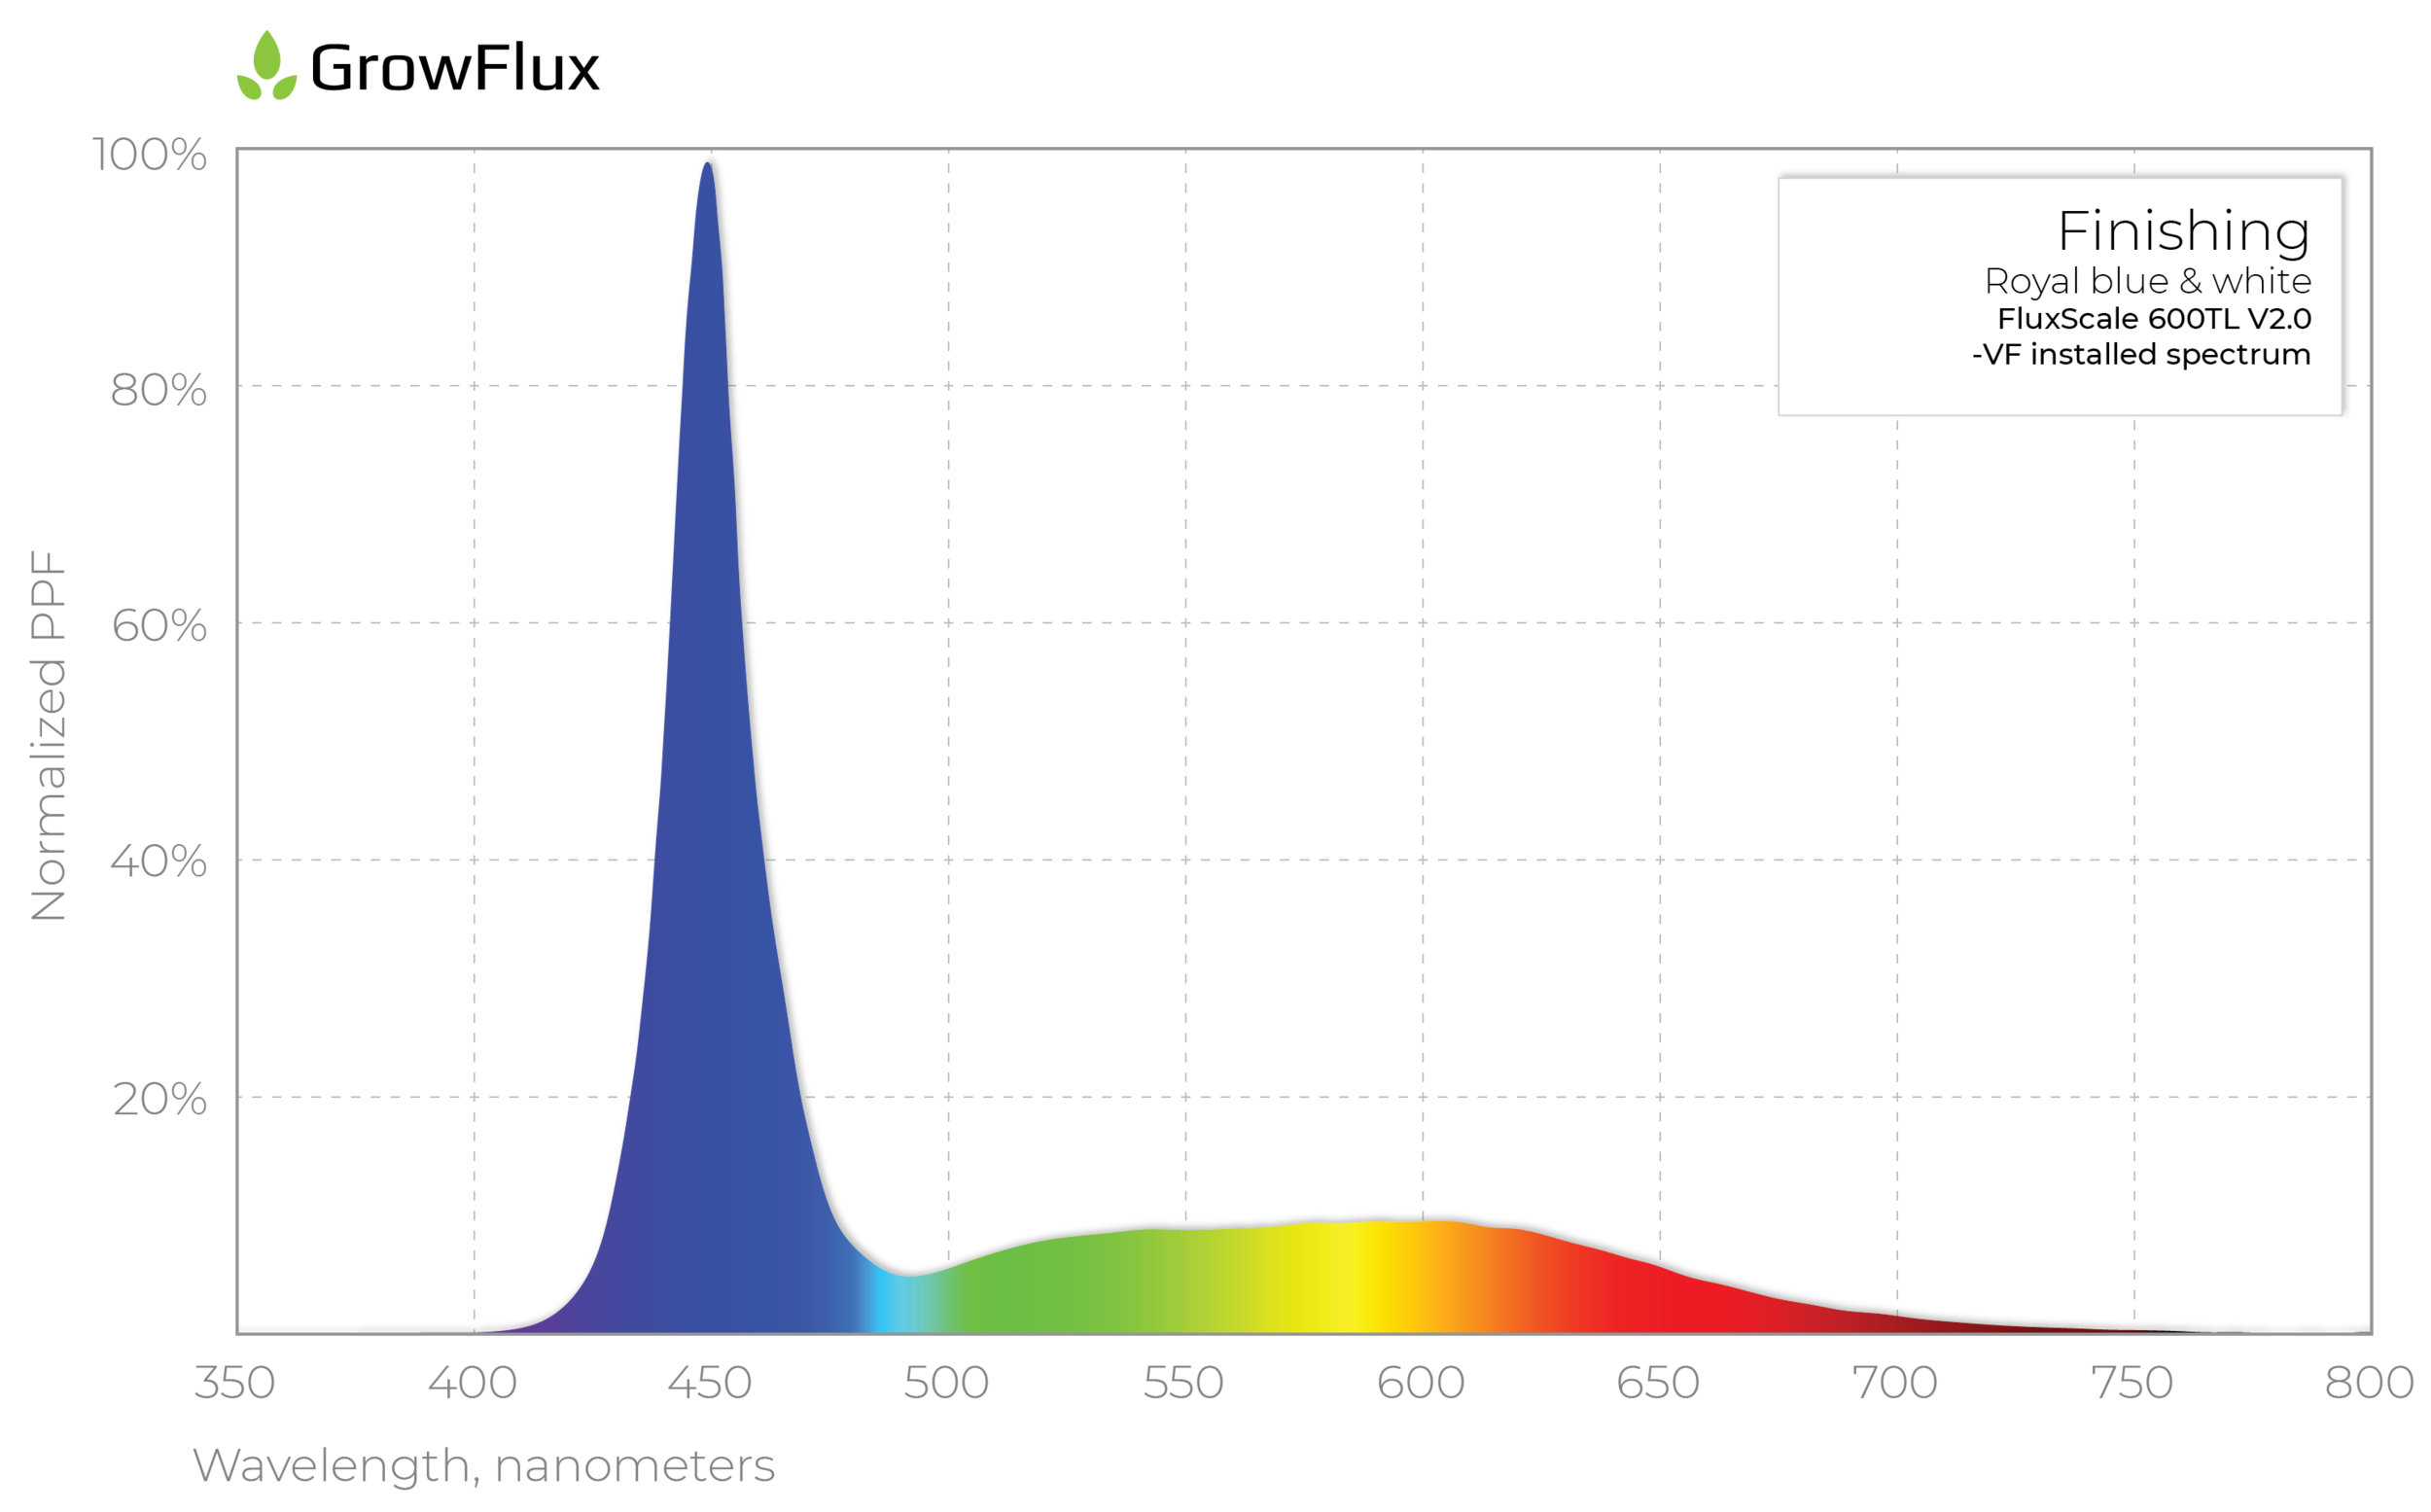 FluxScale 600TL V2.0 Finishing Spectrum